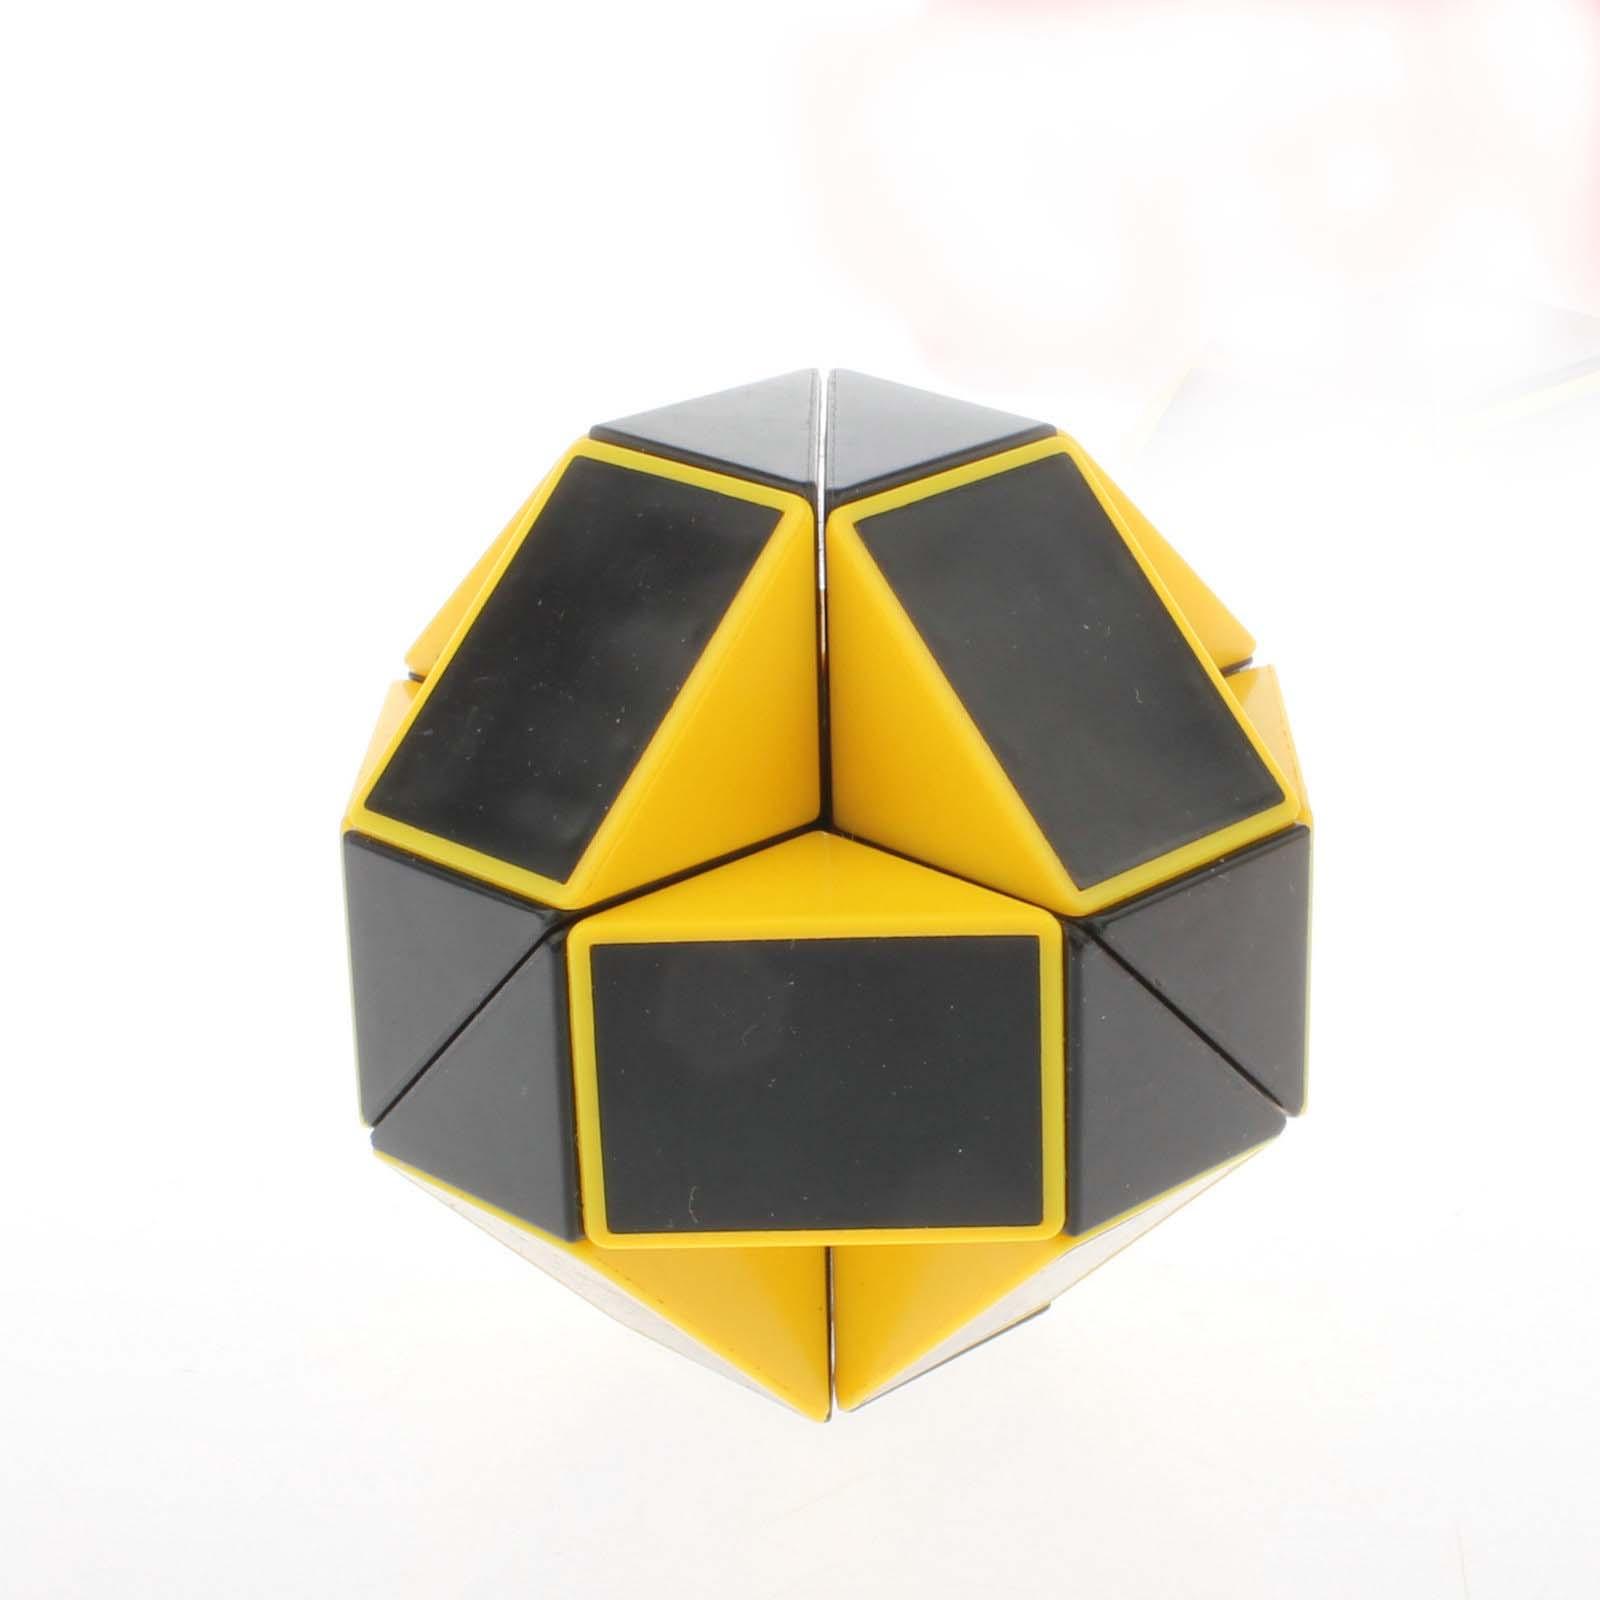 [US Direct] Oostifun Black & Yellow Magic Snake Magic Ruler Puzzle Twisty Toy